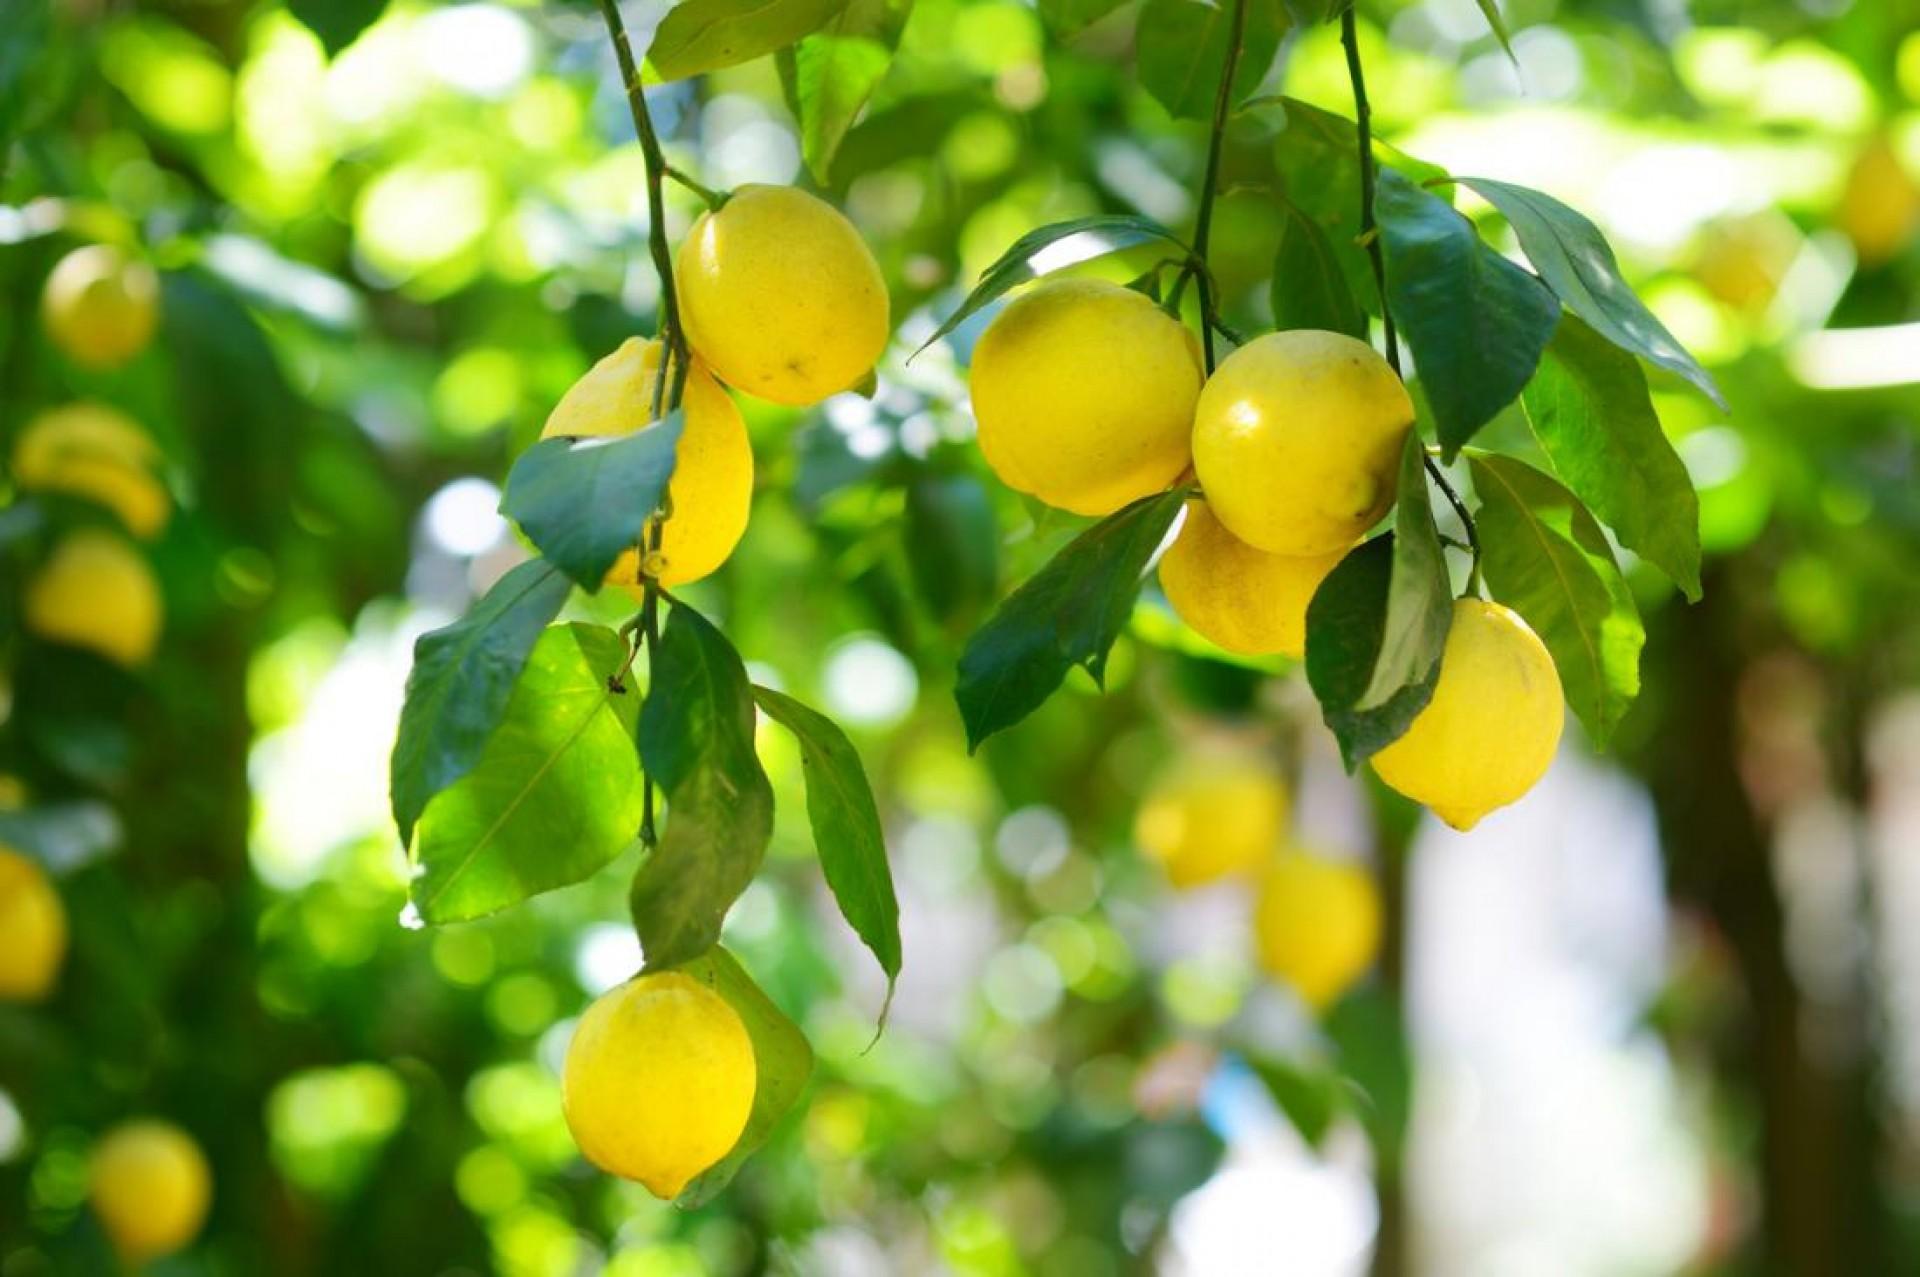 009 Essay Example Lemons Lemon Unusual Clot Reddit Bbc 1920